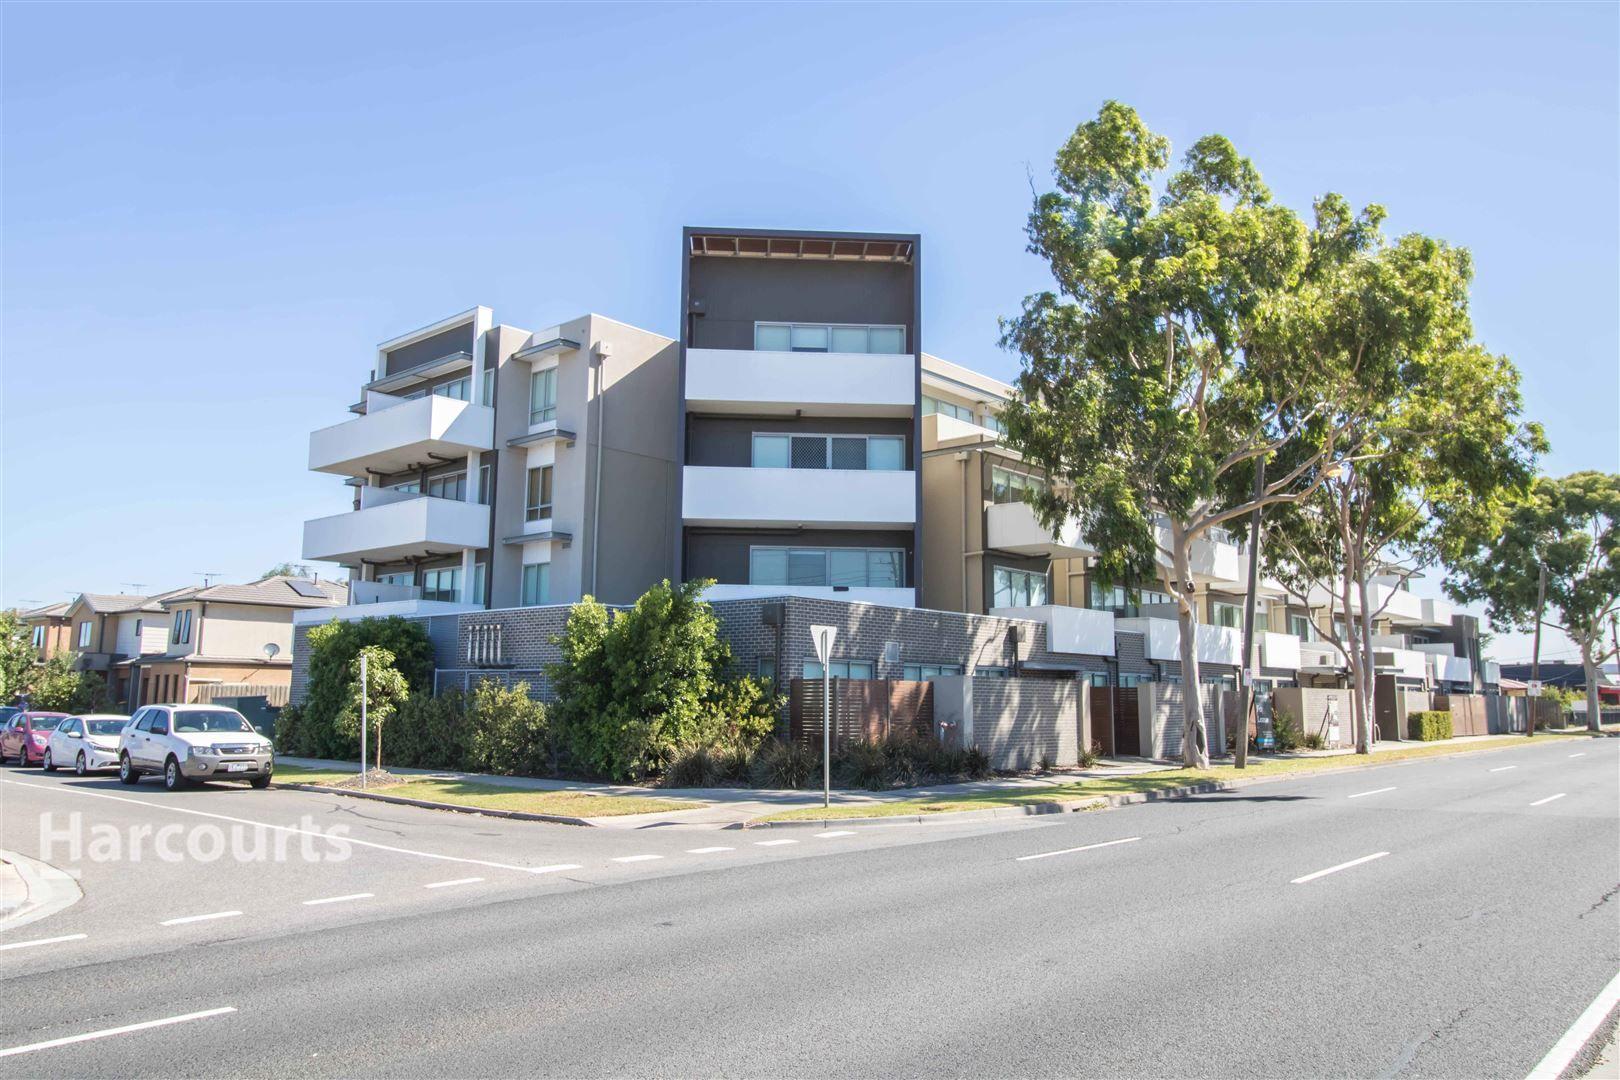 116/251 Ballarat Road, Braybrook VIC 3019, Image 0